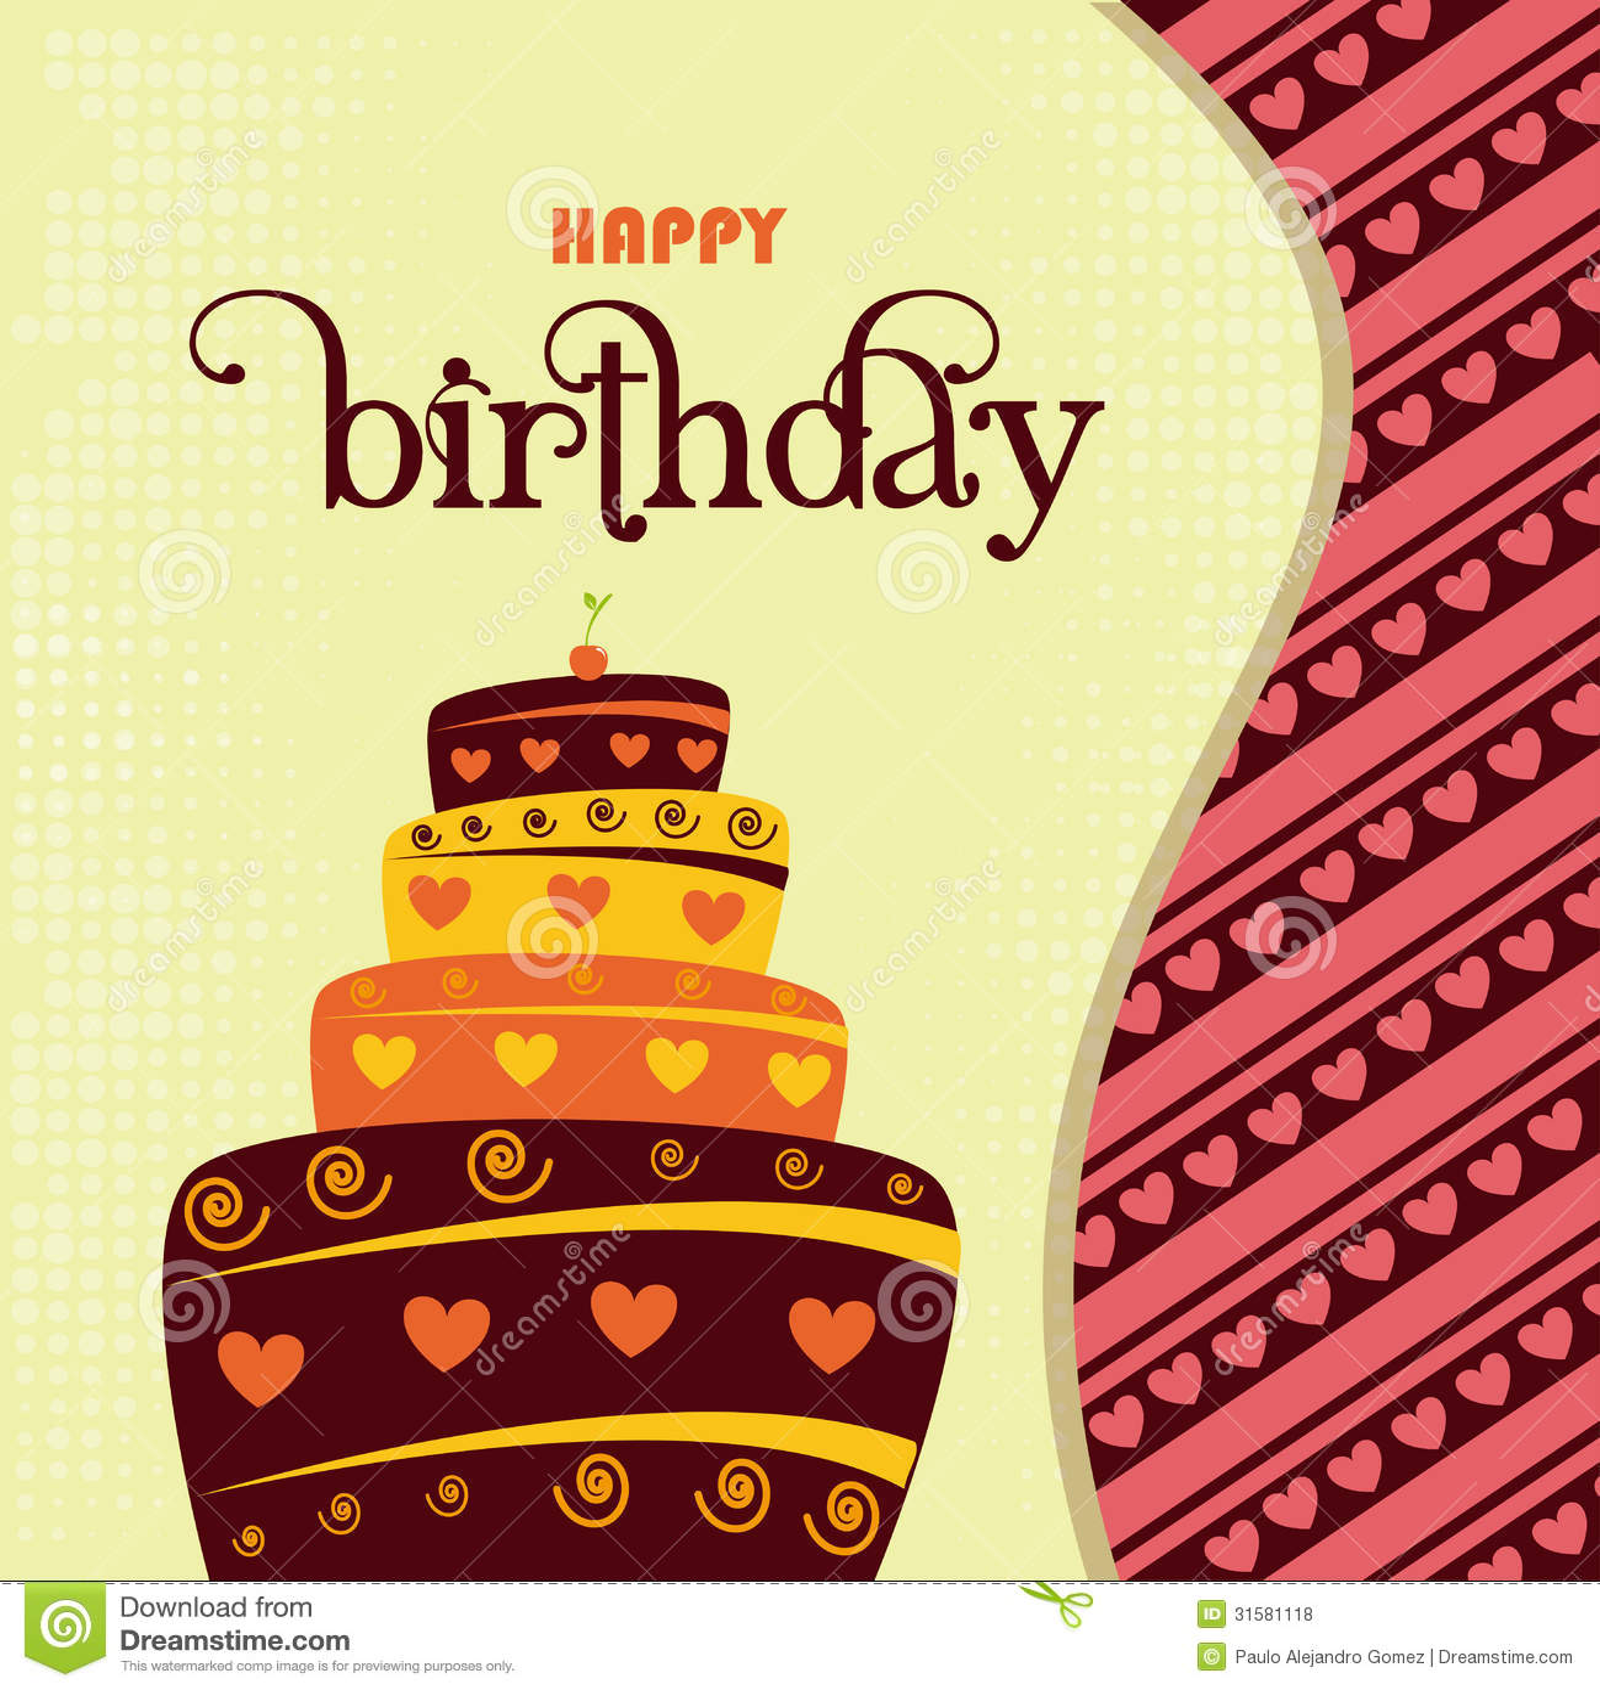 Happy Birthday Design Royalty Free Stock Photos Image